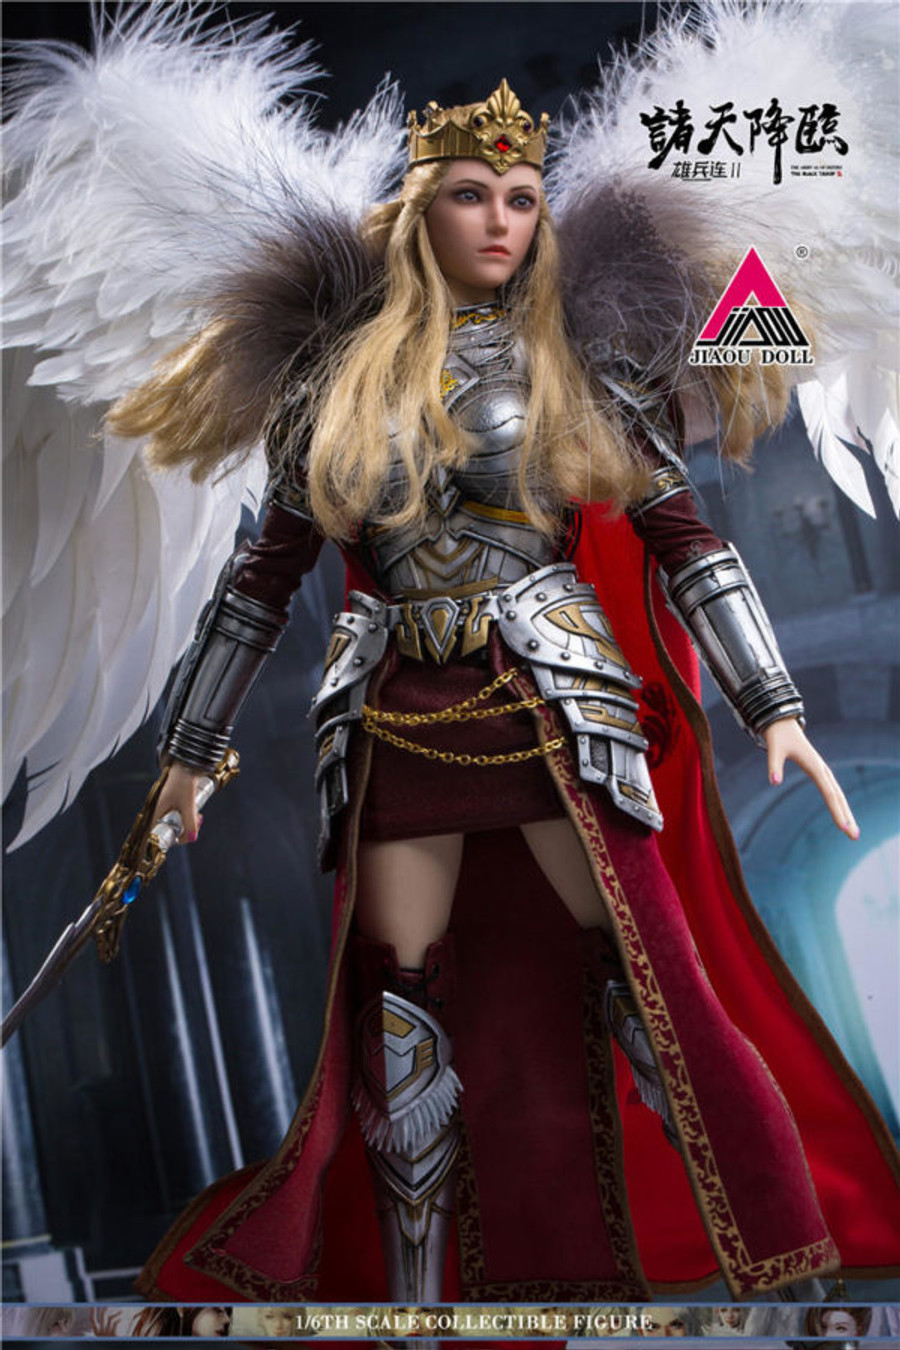 Super Seminary - Angel Yan Crown Edition